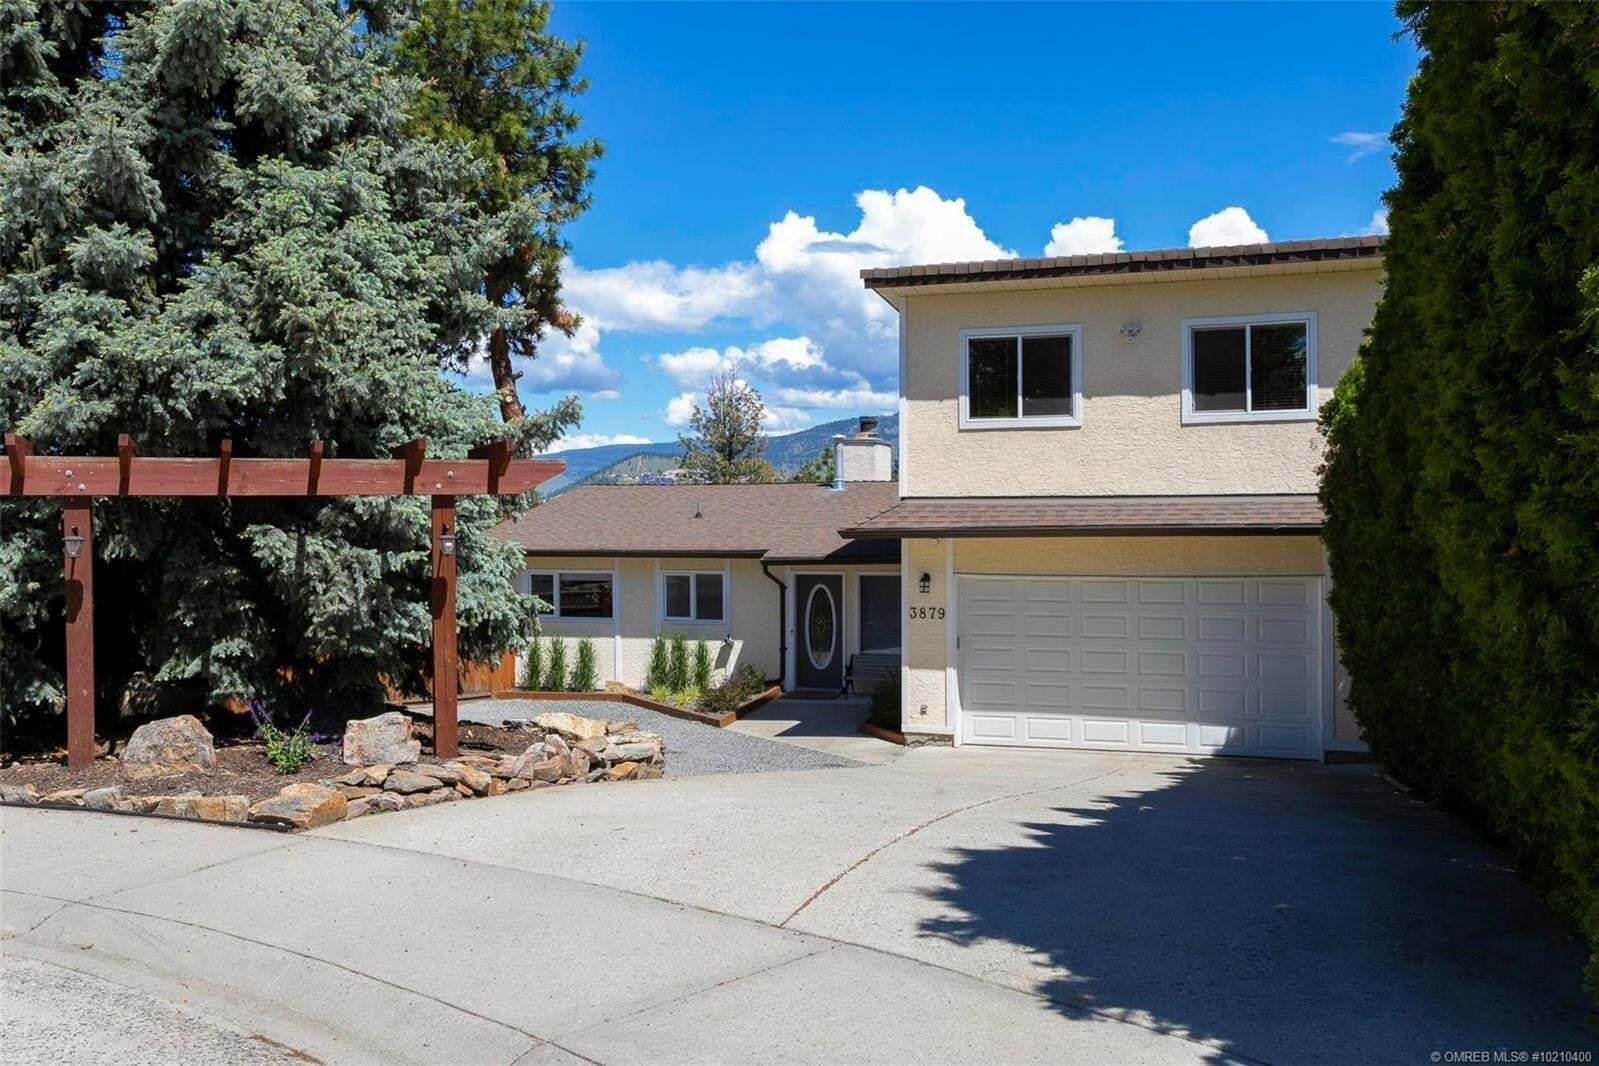 House for sale at 3879 Suncrest Ct Kelowna British Columbia - MLS: 10210400